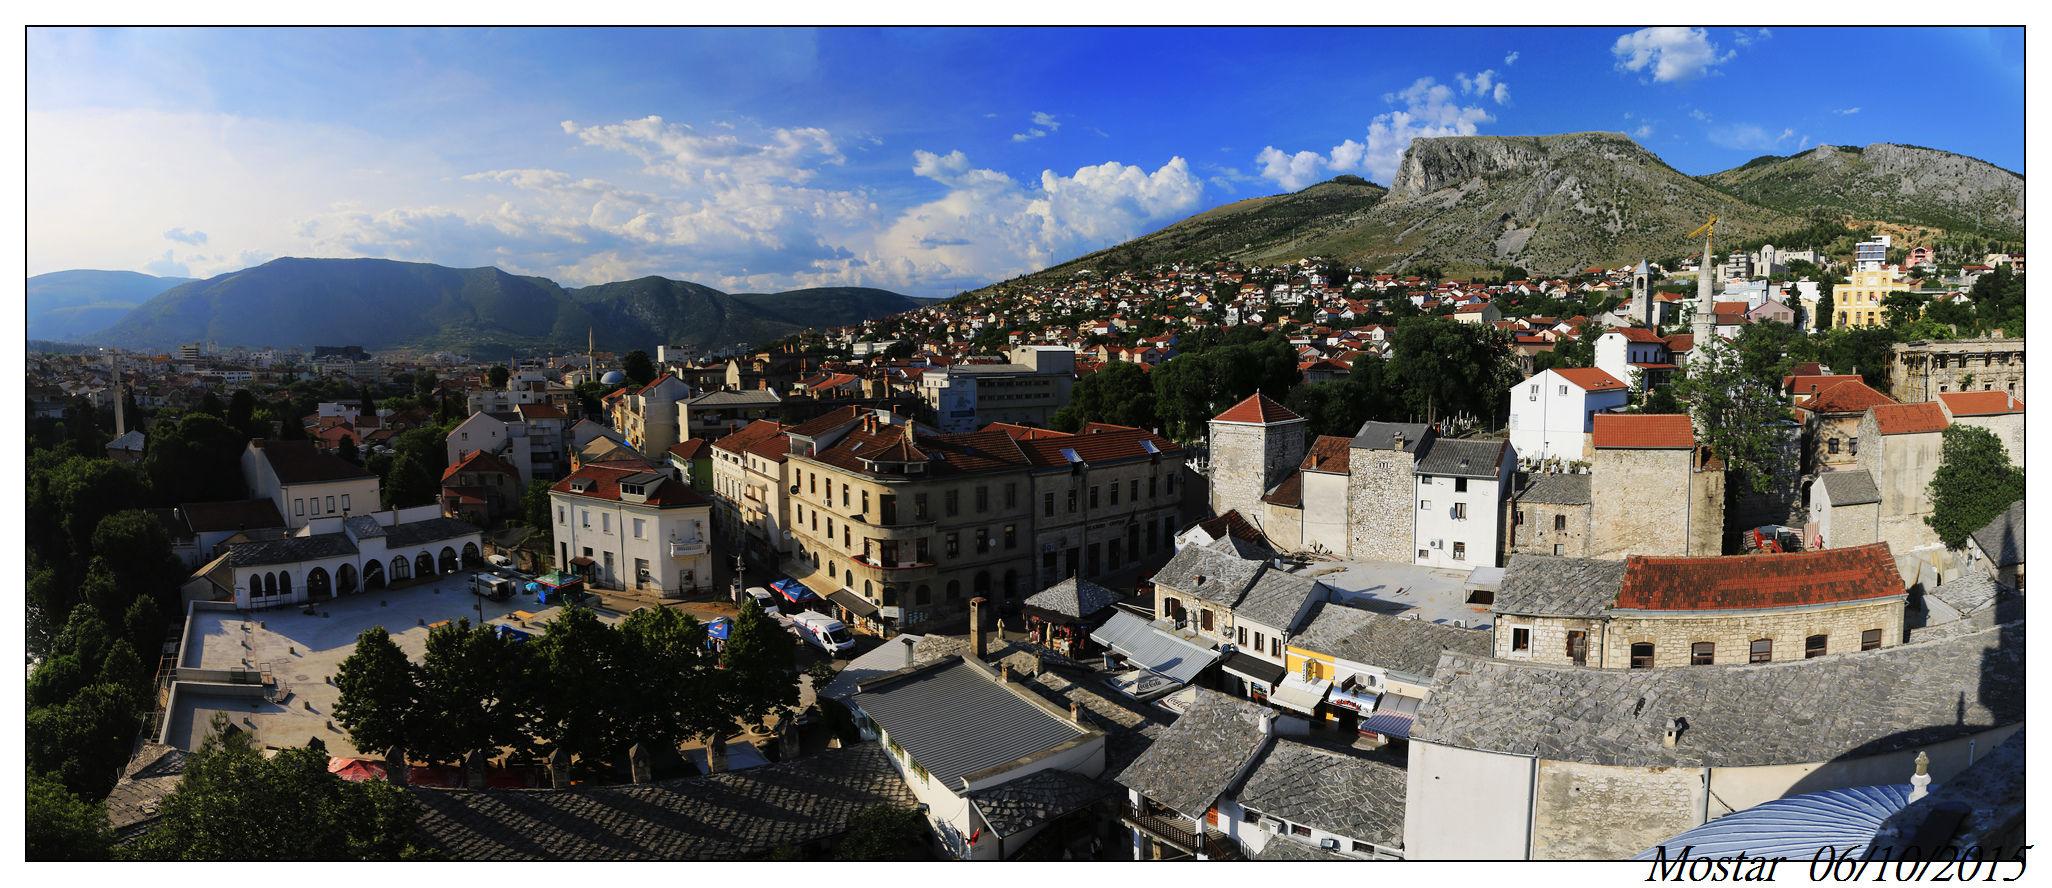 Mostar_全景3.jpg